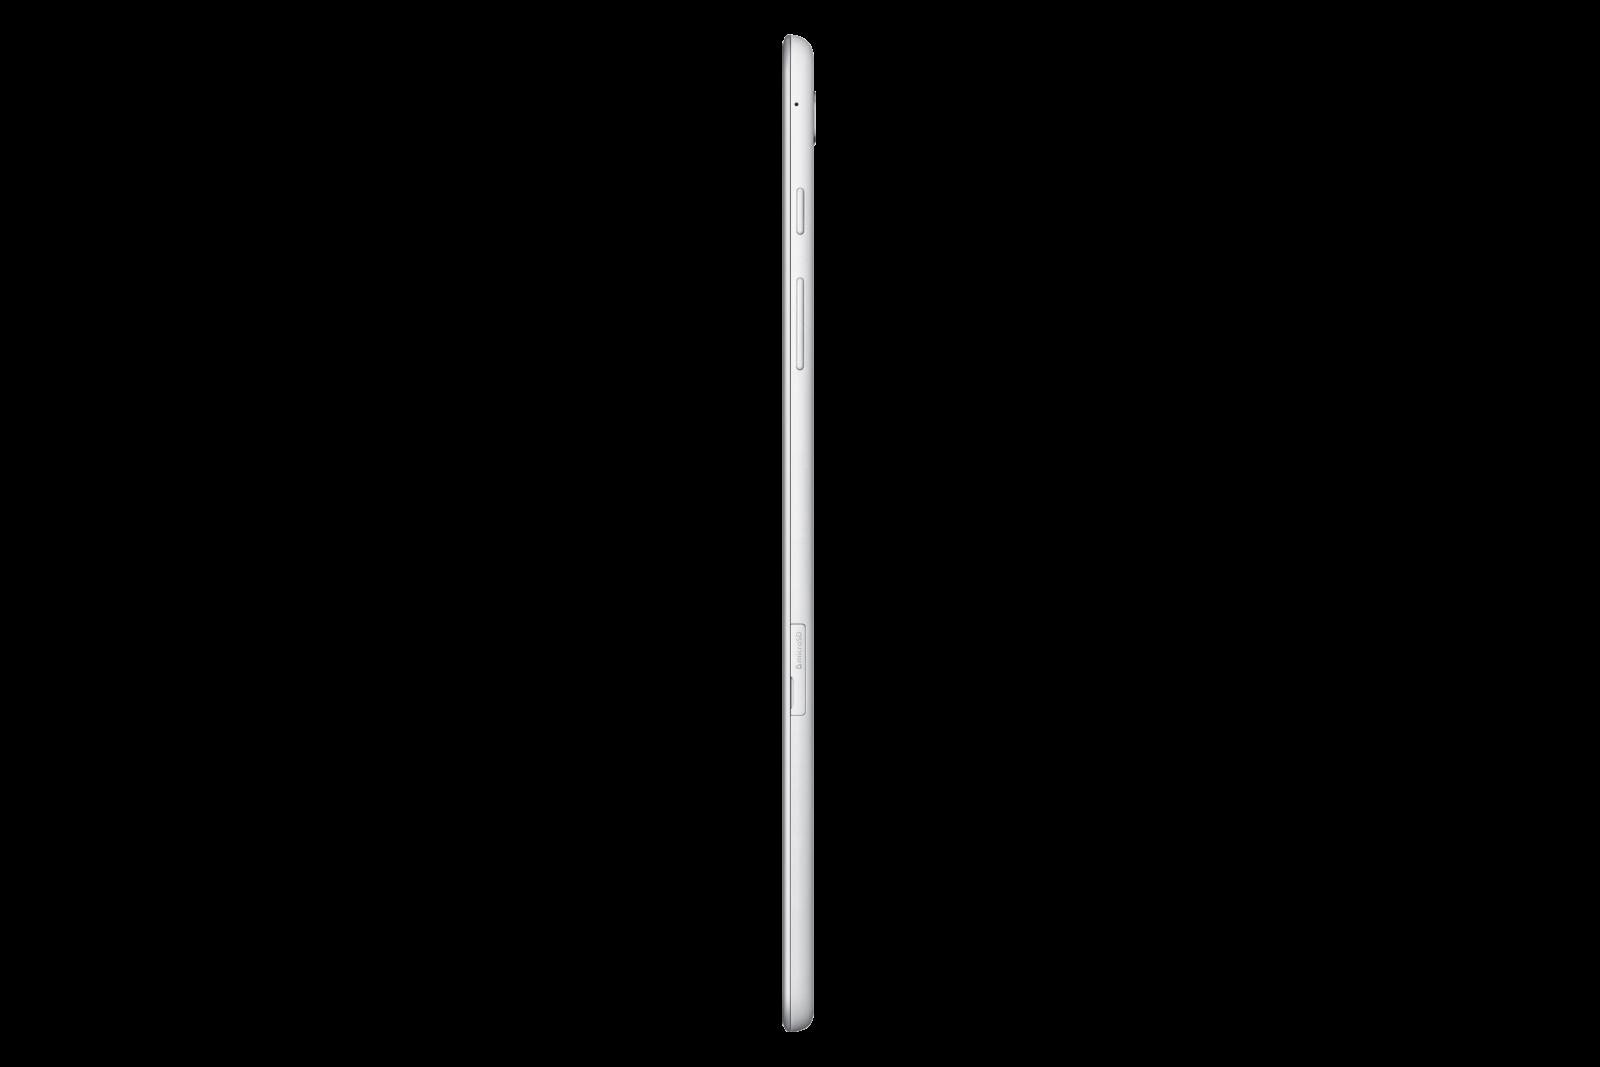 SM-T550_003_Side_White